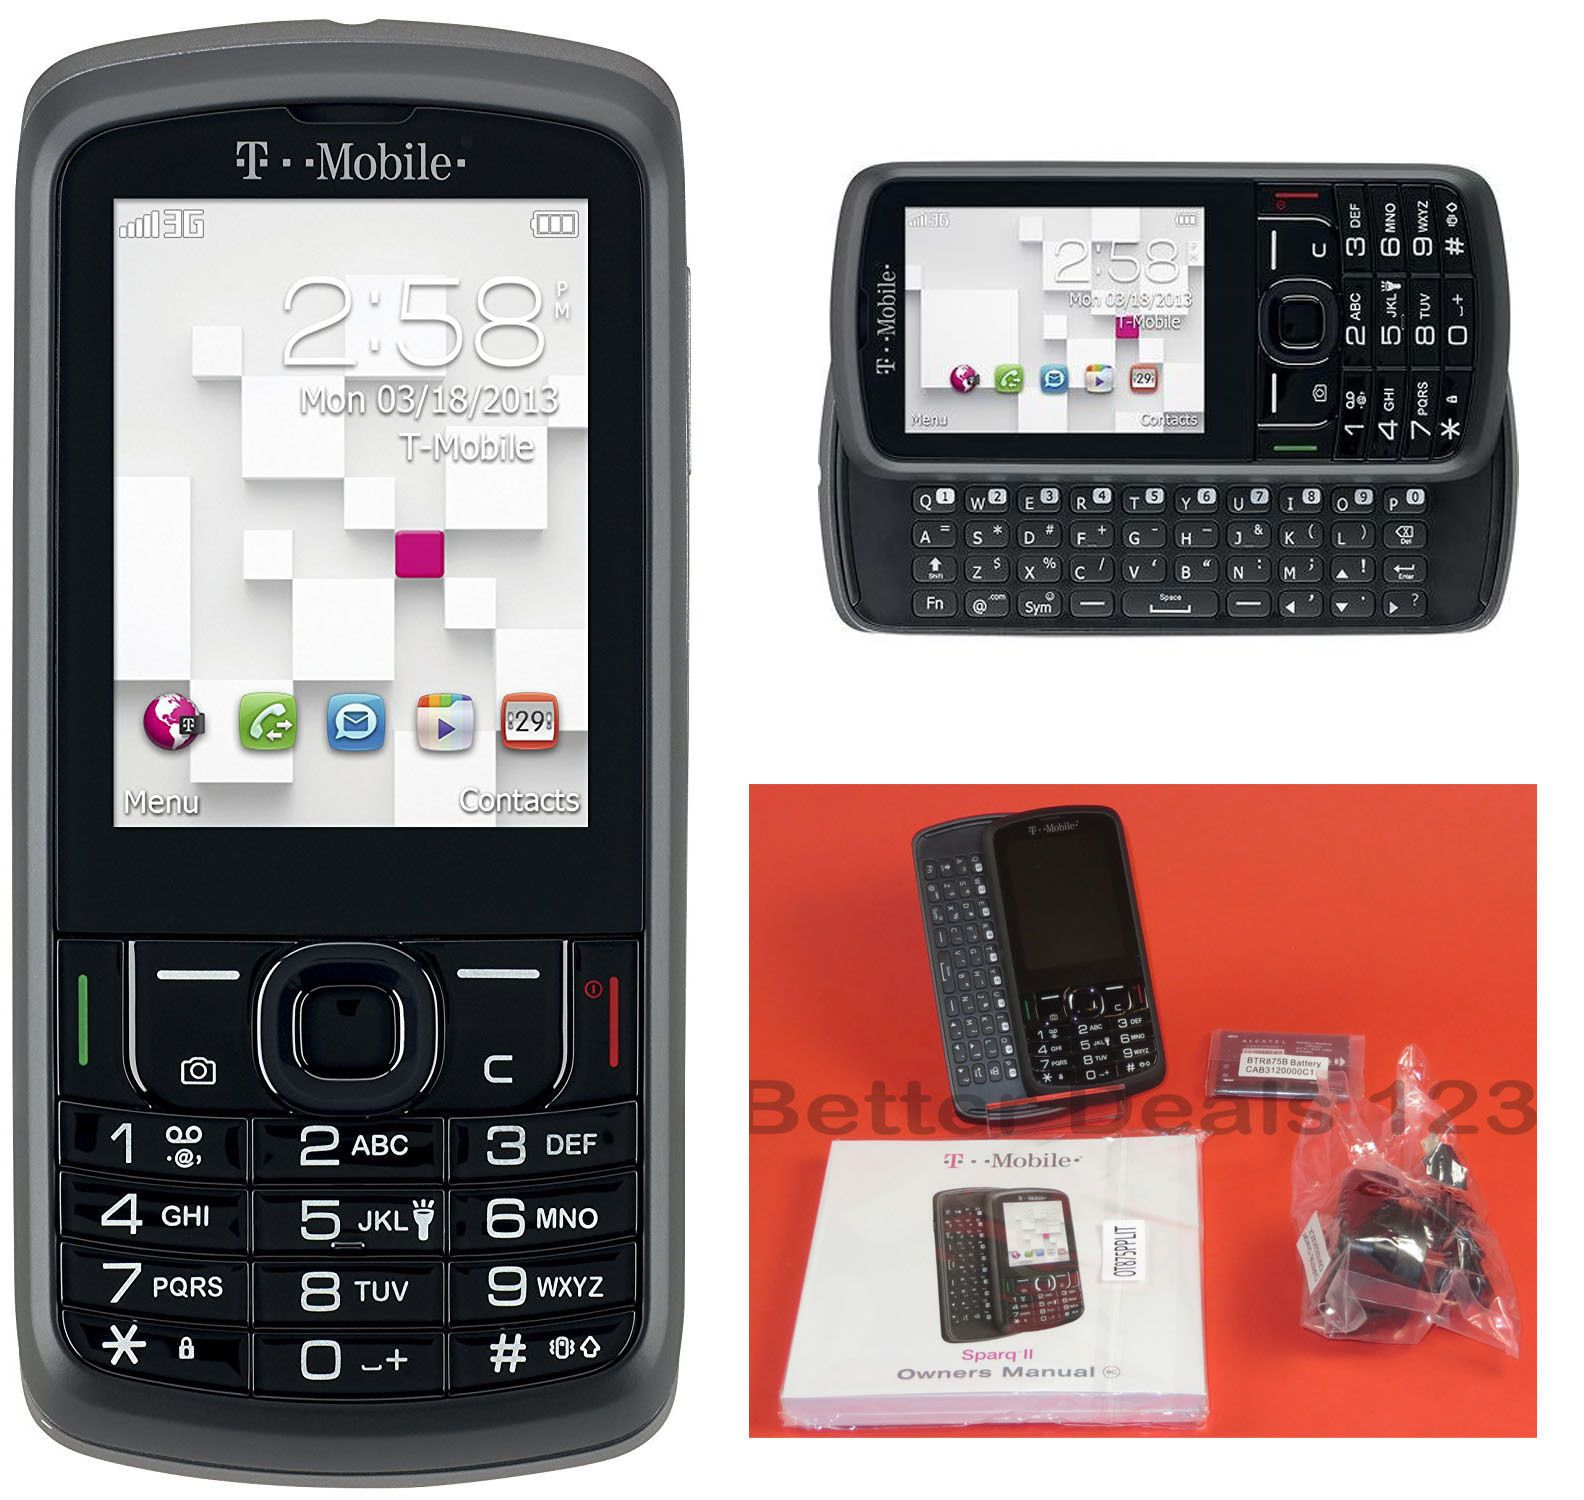 new post new alcatel sparq ii 2 unlocked t mobile slider 3g cell rh pinterest com T-Mobile Sparq Earhone Part T-Mobile SPARQ Cases